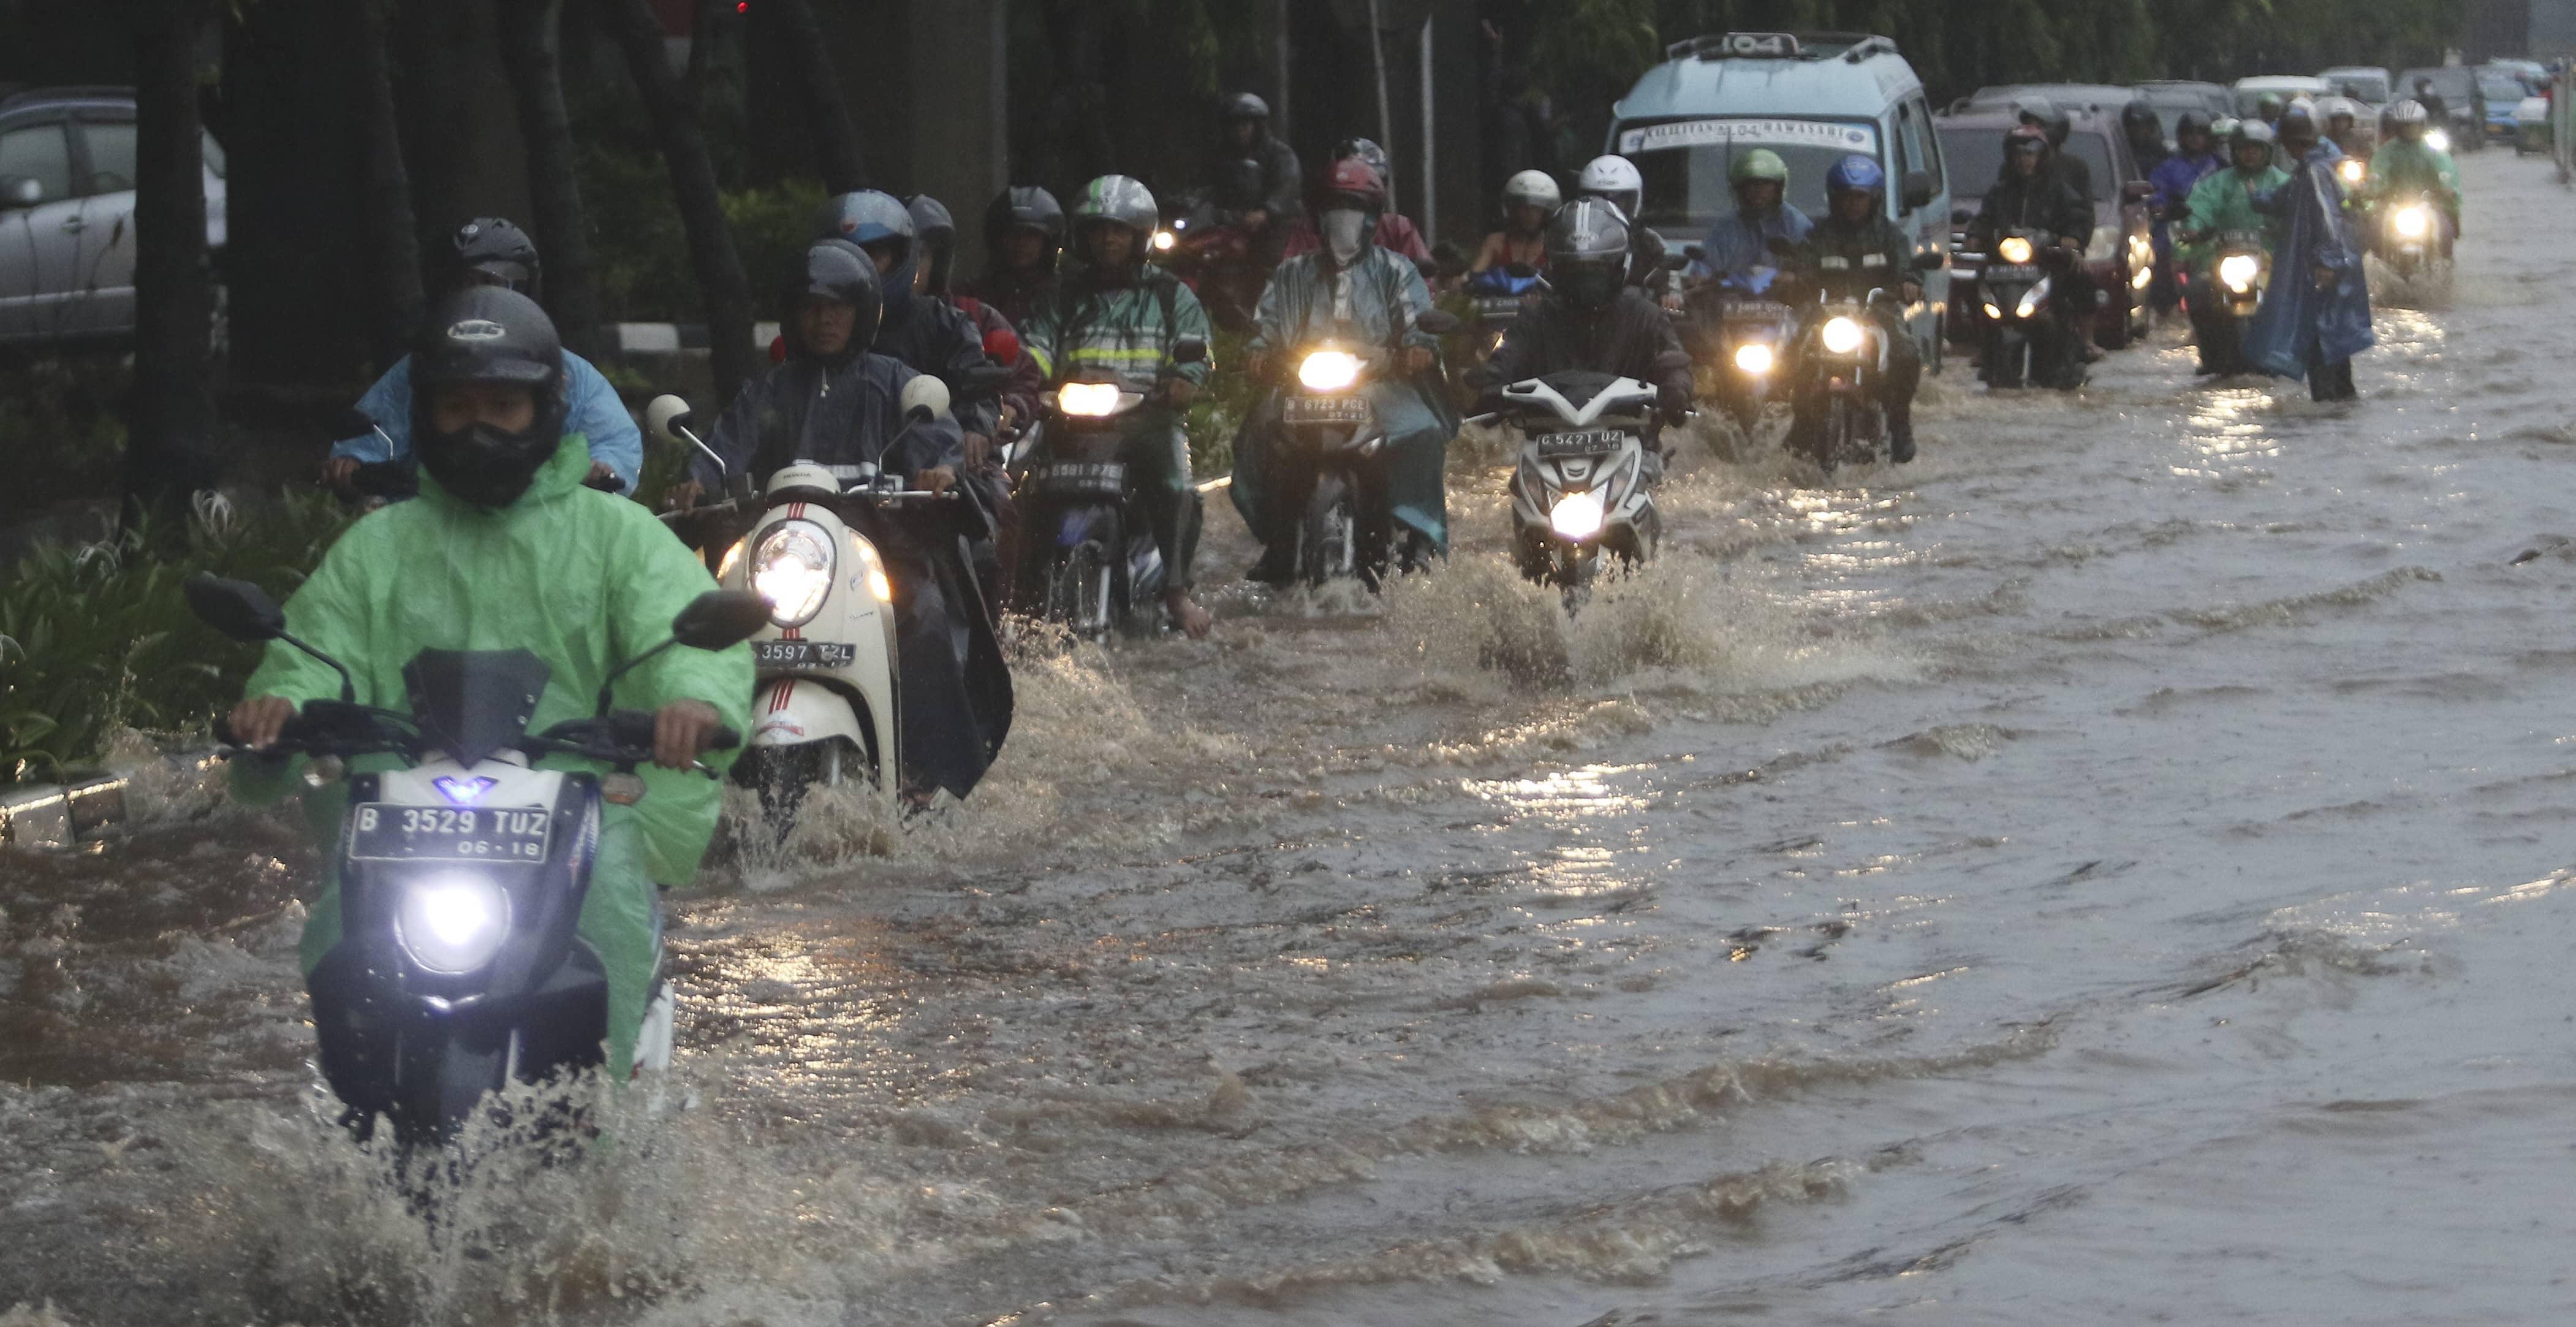 Motorcyclists pass floodwaters in easter Jakarta in December (Photo: Eko Siswono Toyudho/Getty)